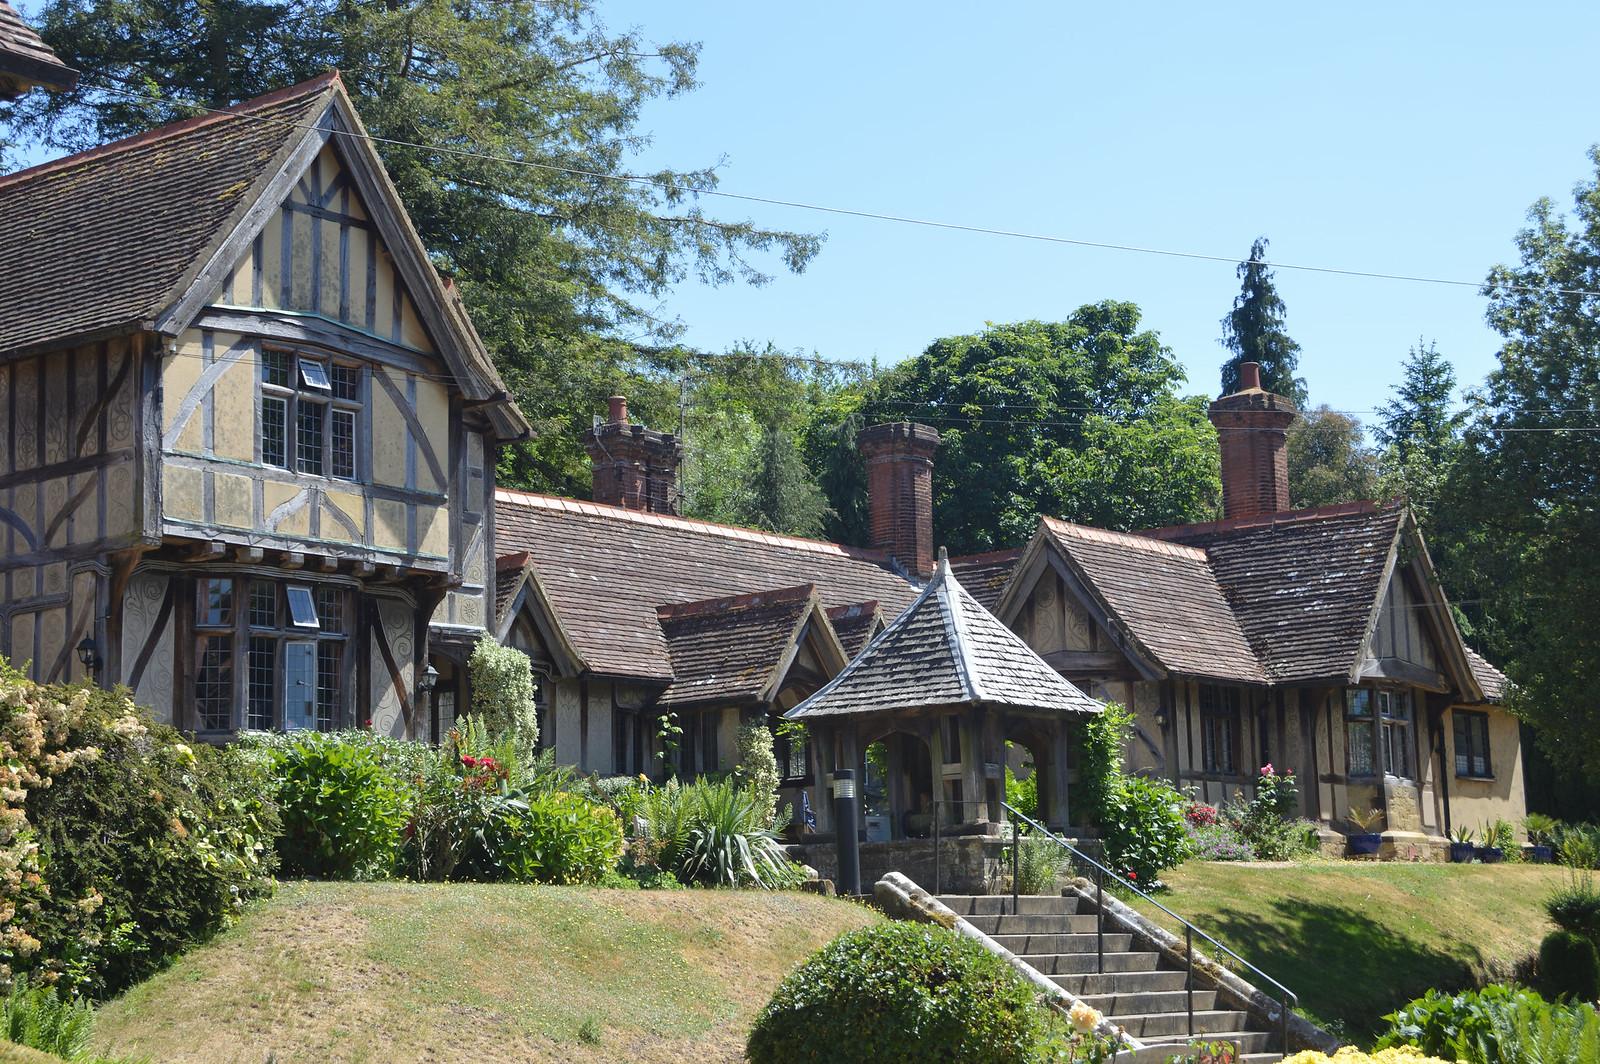 Godstone almshouses